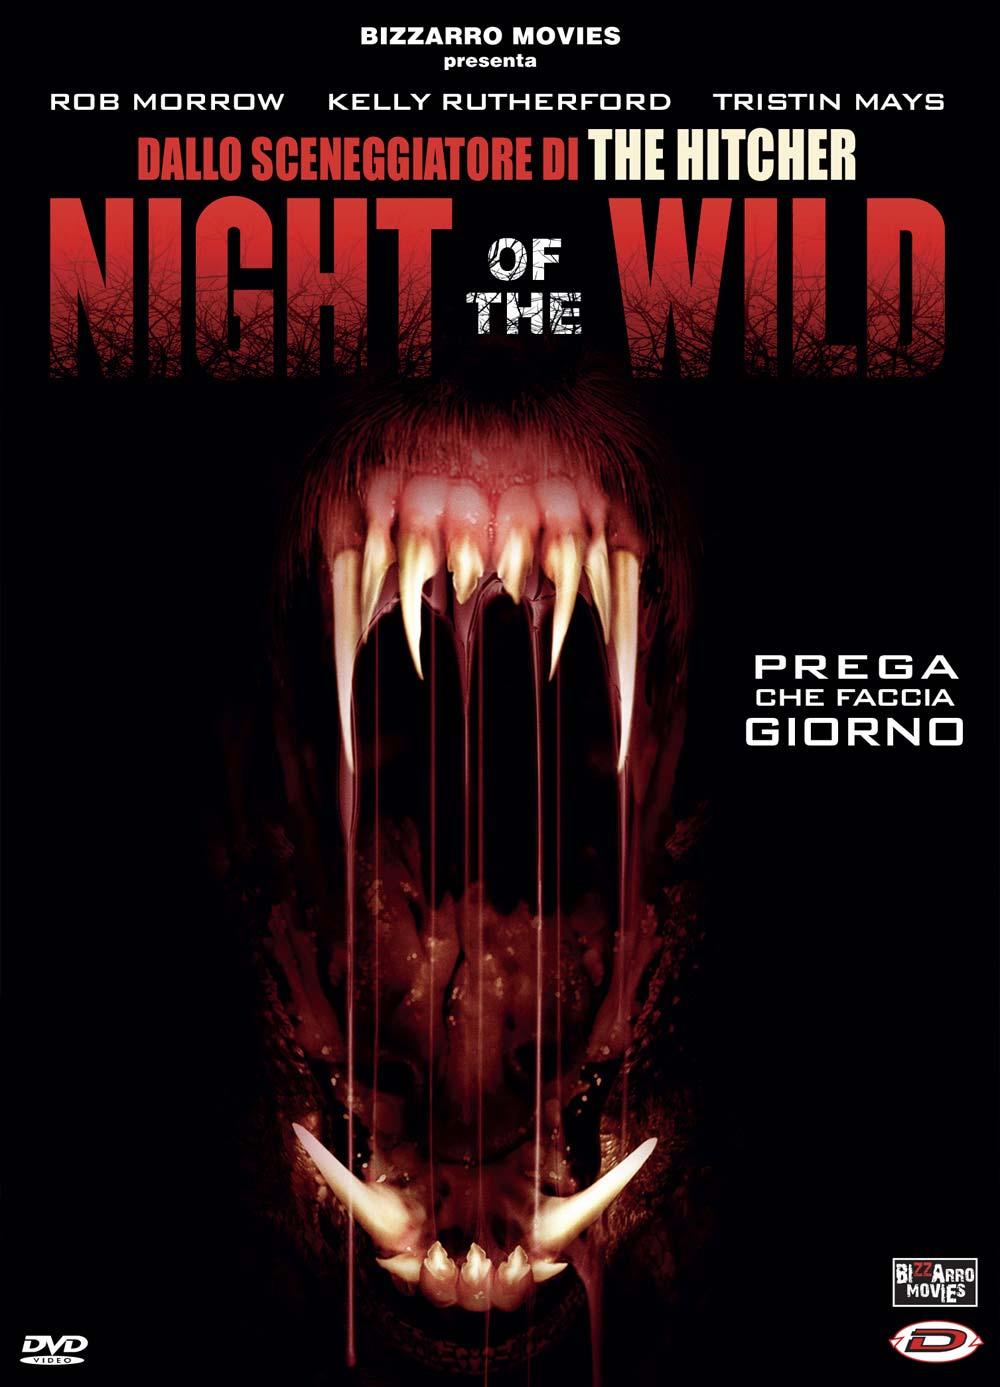 NIGHT OF THE WILD (DVD)